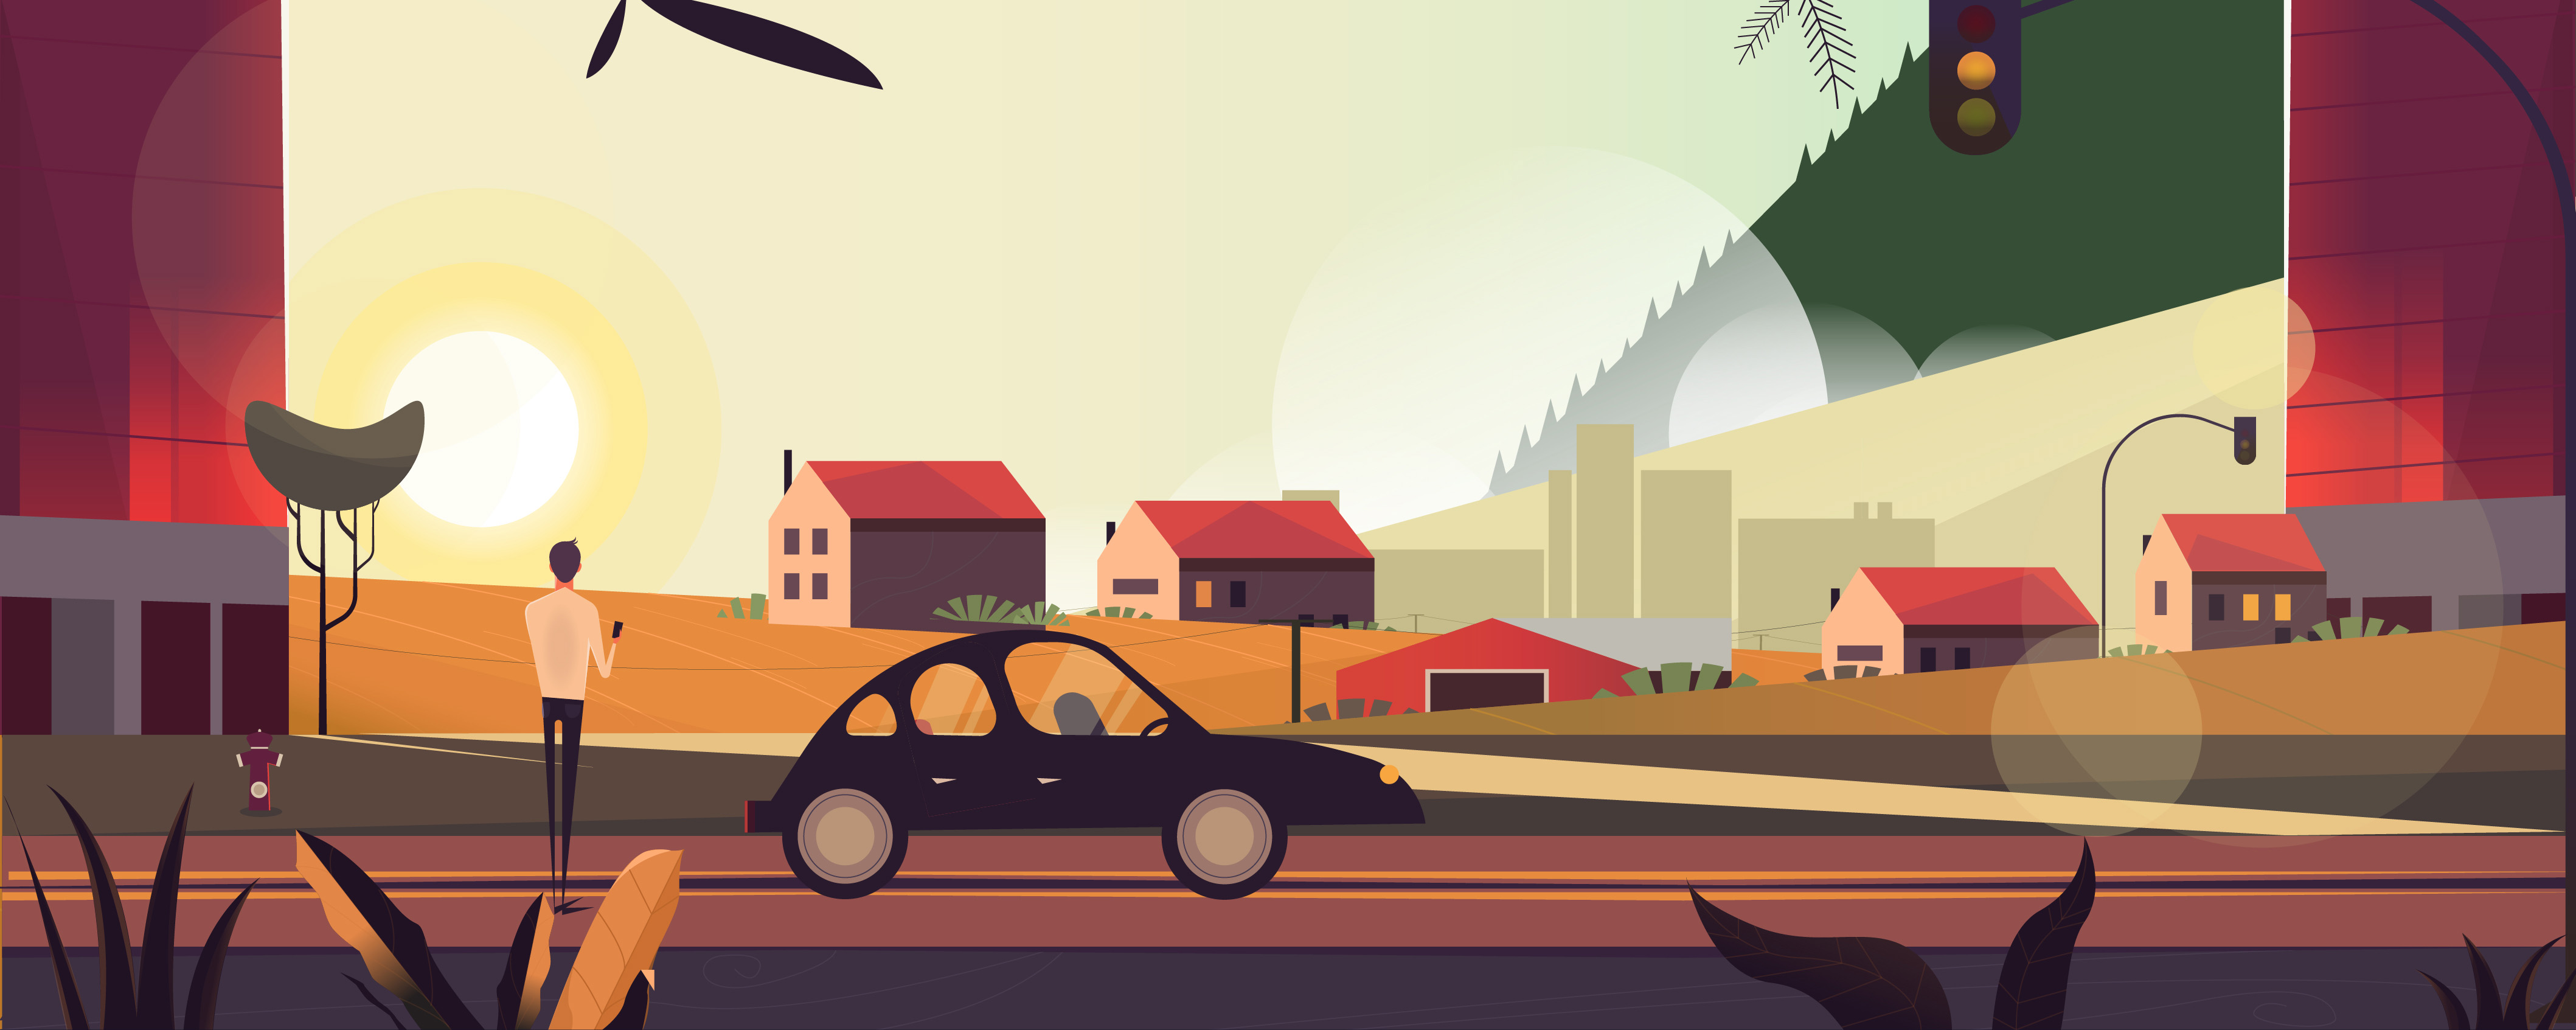 Car scene